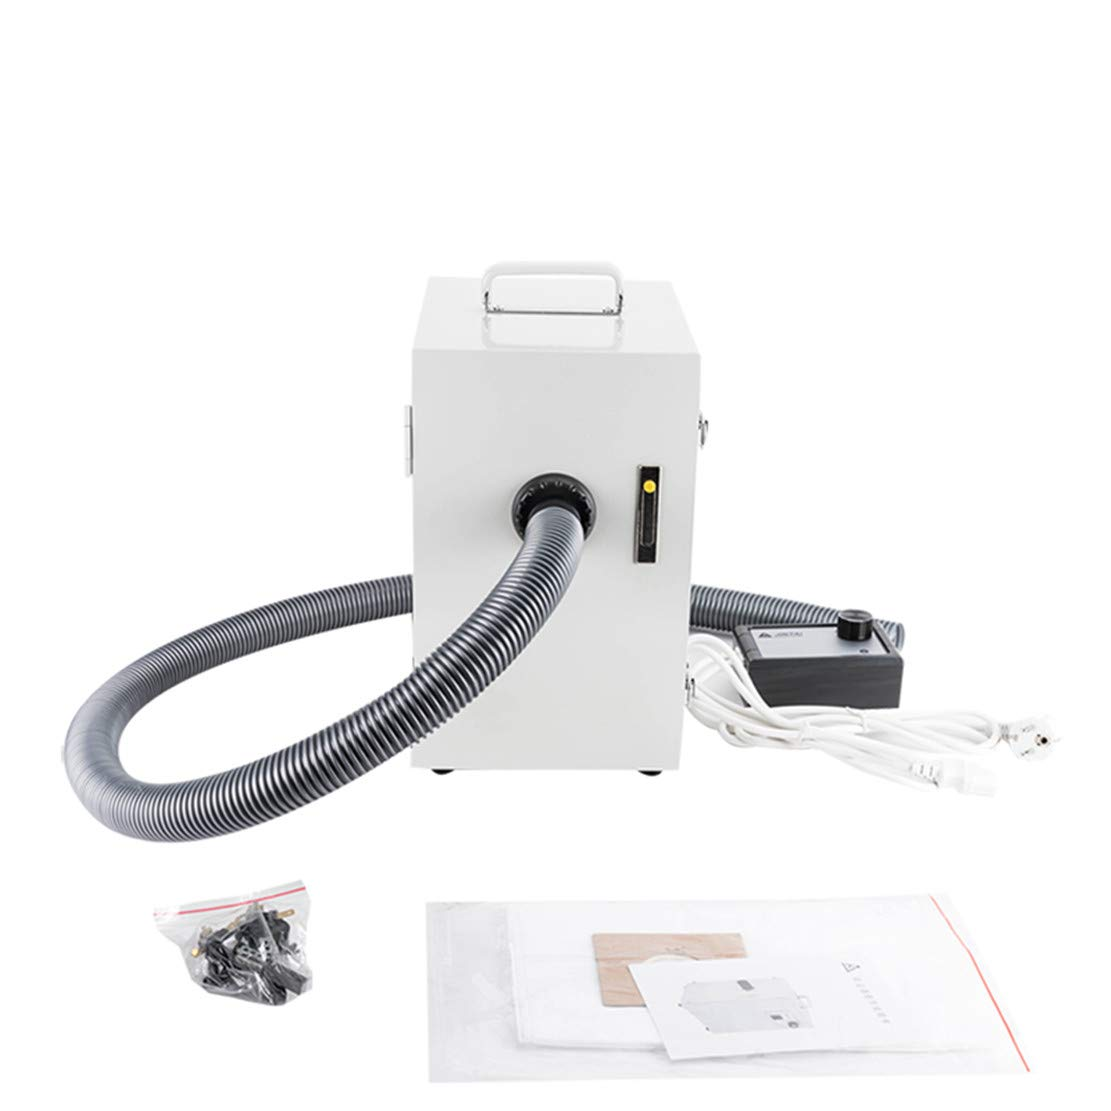 T-king Single Port Dental Lab Laboratory Vacuum Cleaner Dust Collector Mute Vacuum Machine